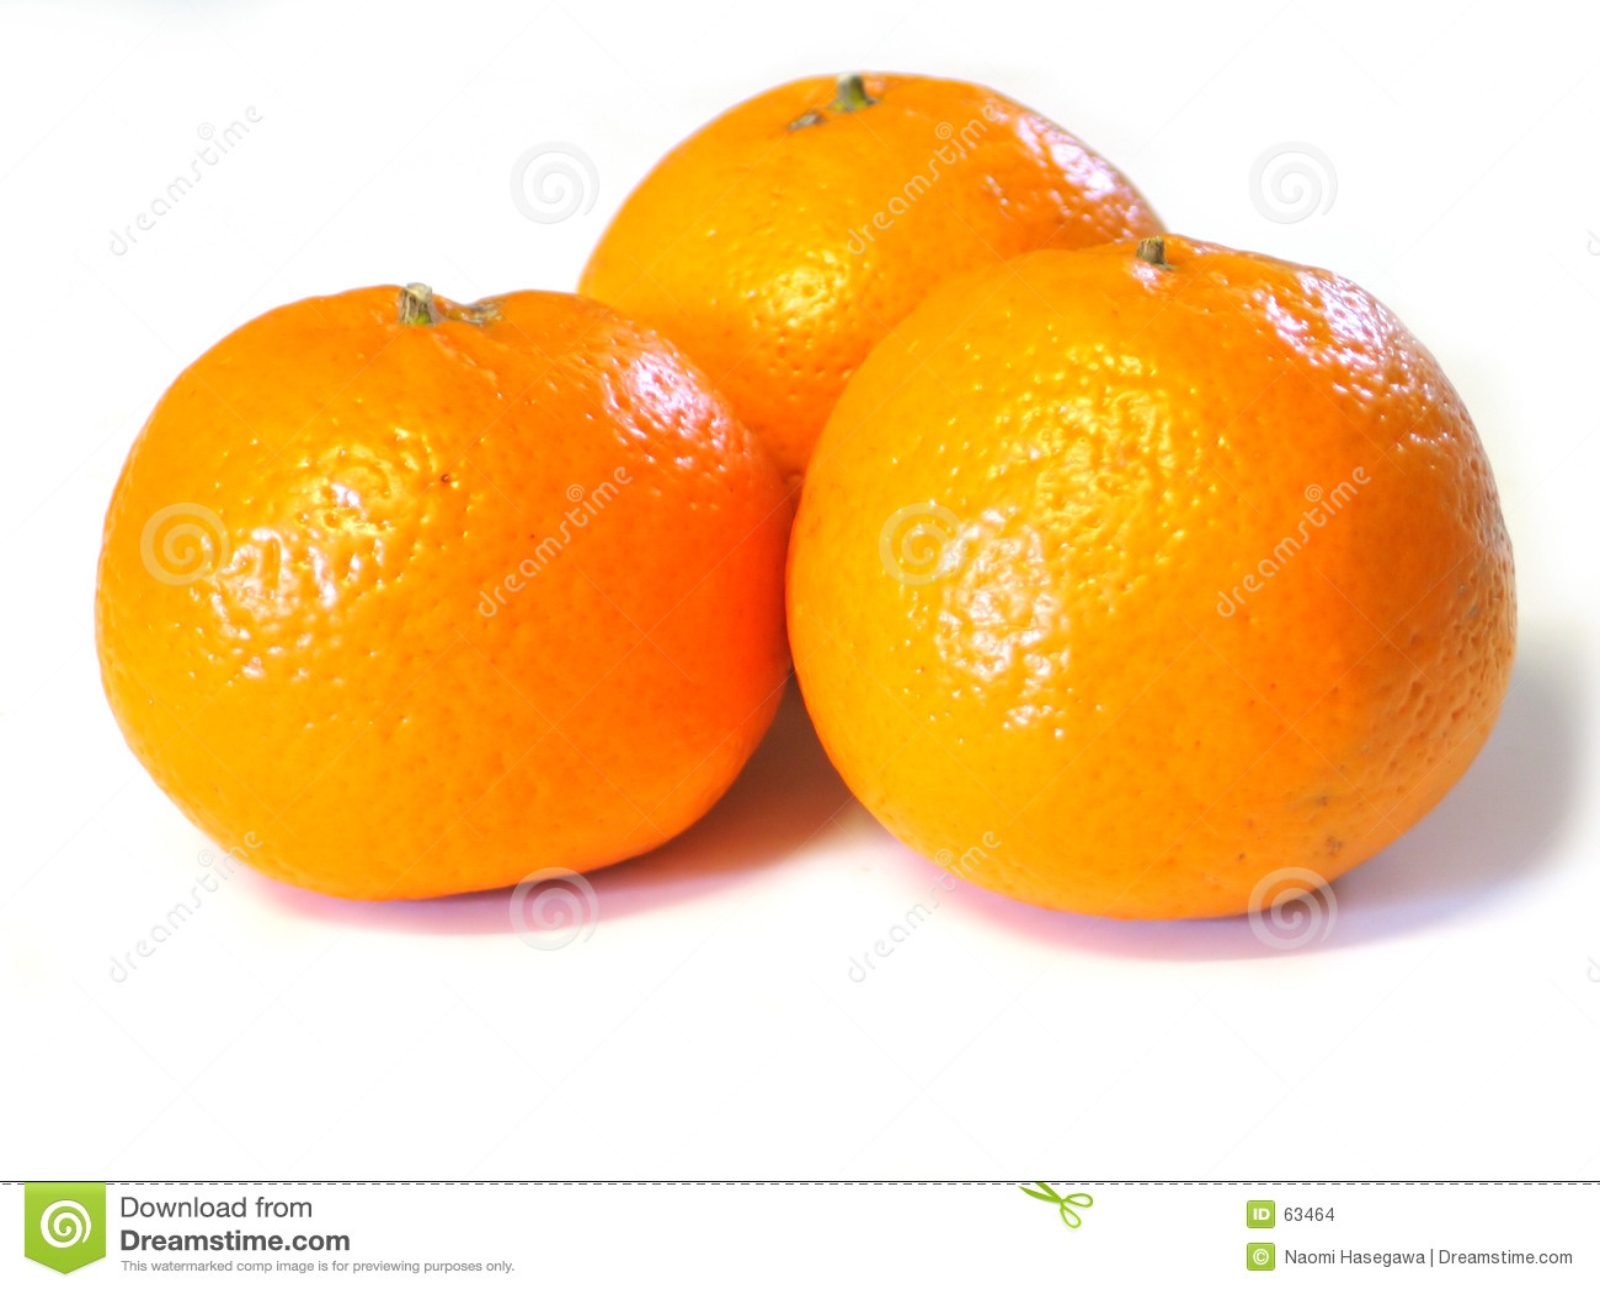 Mandarin Oranges Stock Images - Image: 63464